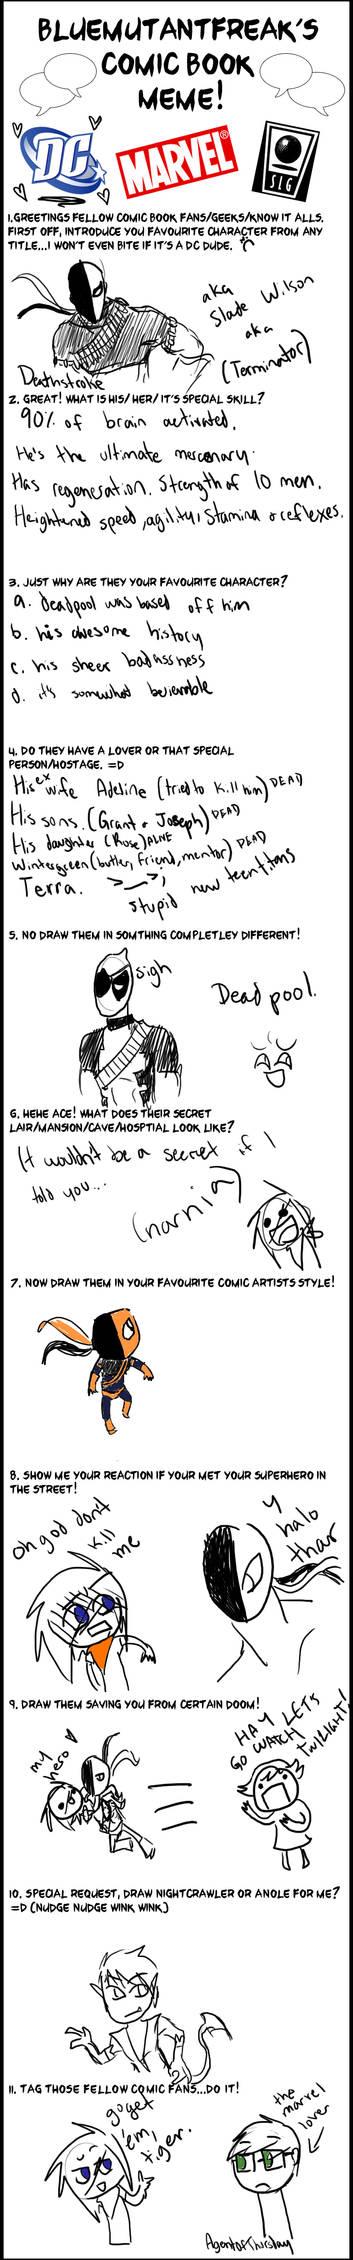 Comic Book Meme by Erewolf